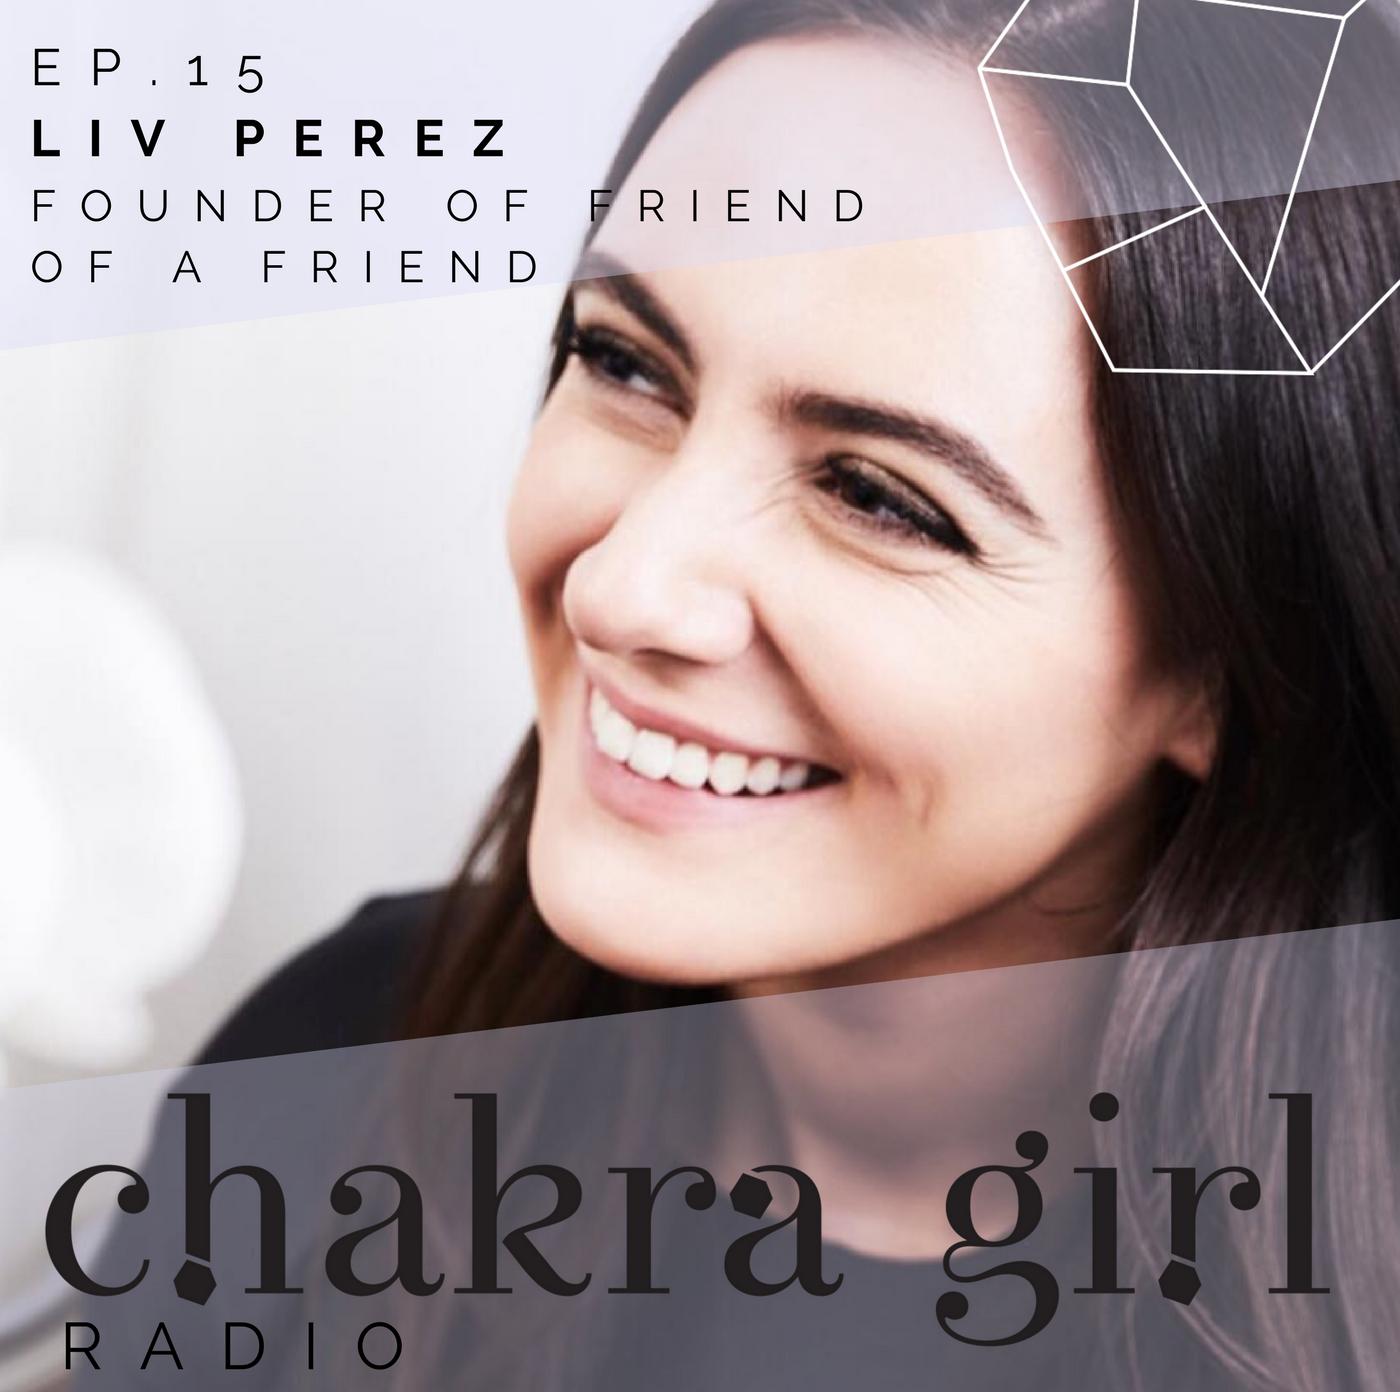 LIV PEREZ CHAKRA GIRL RADIO.png